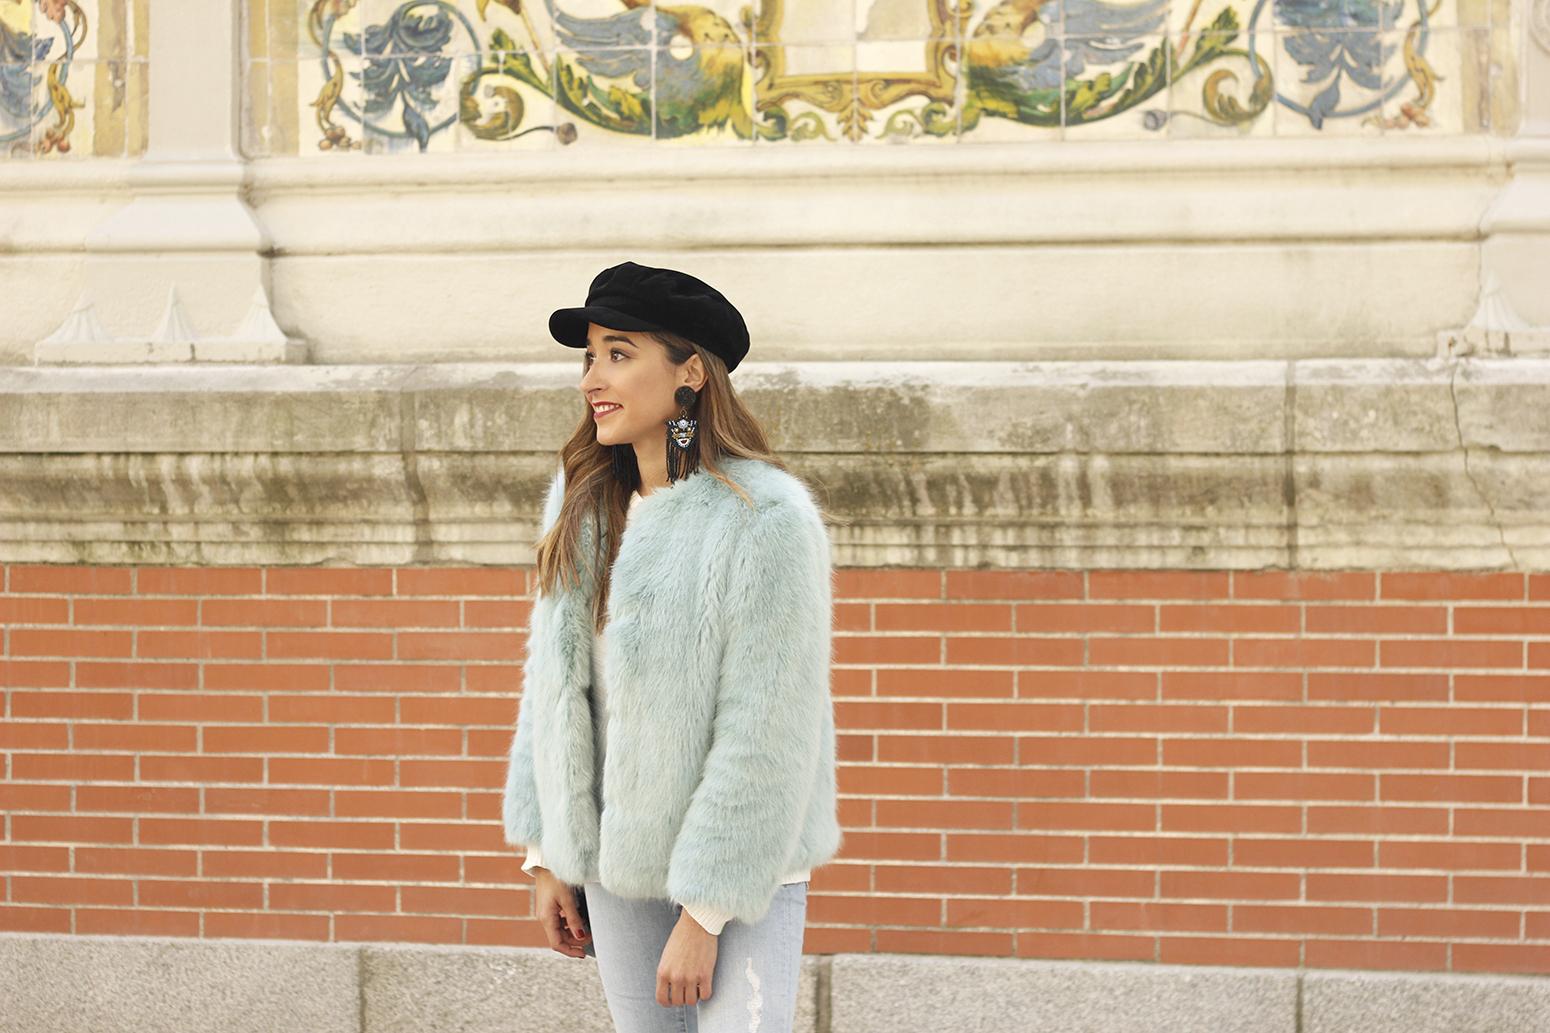 blue light faux fur coat navy cap ripped jeans zara tiger uterqüe earrings outfit street style08